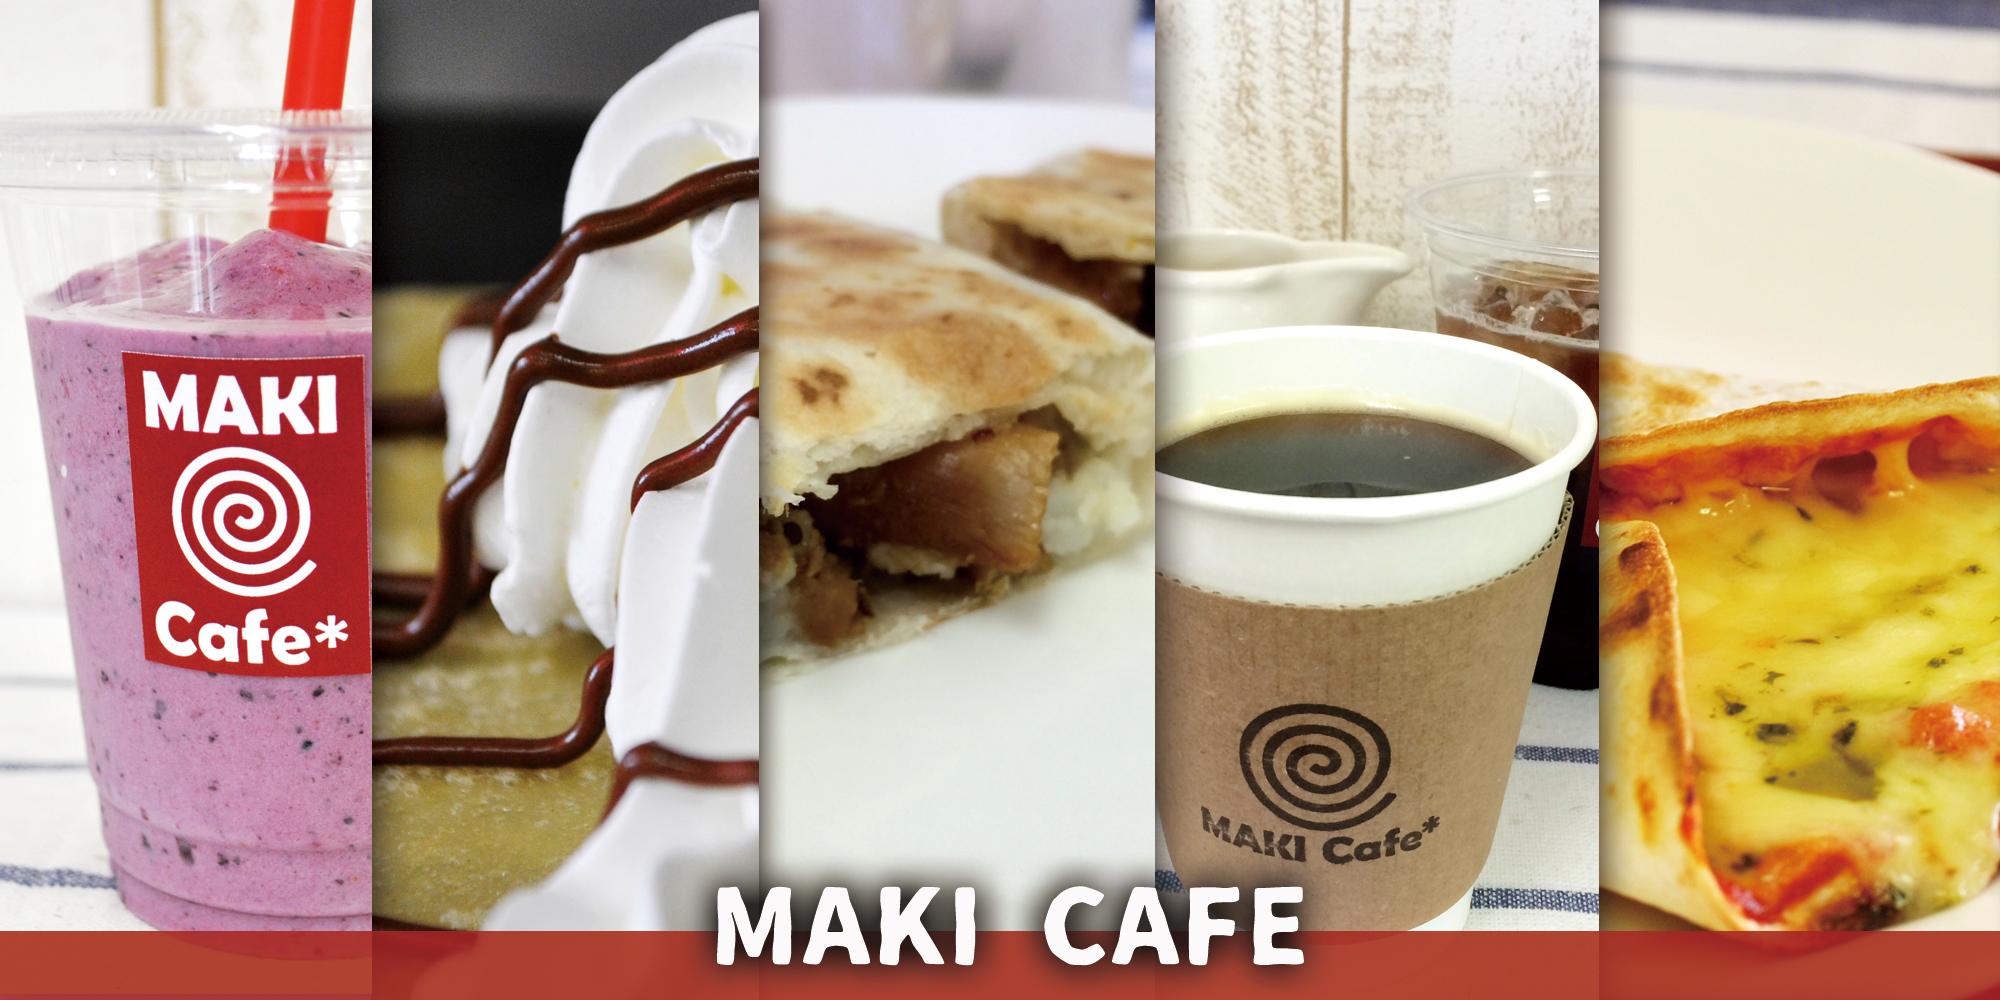 MAKI Cafe